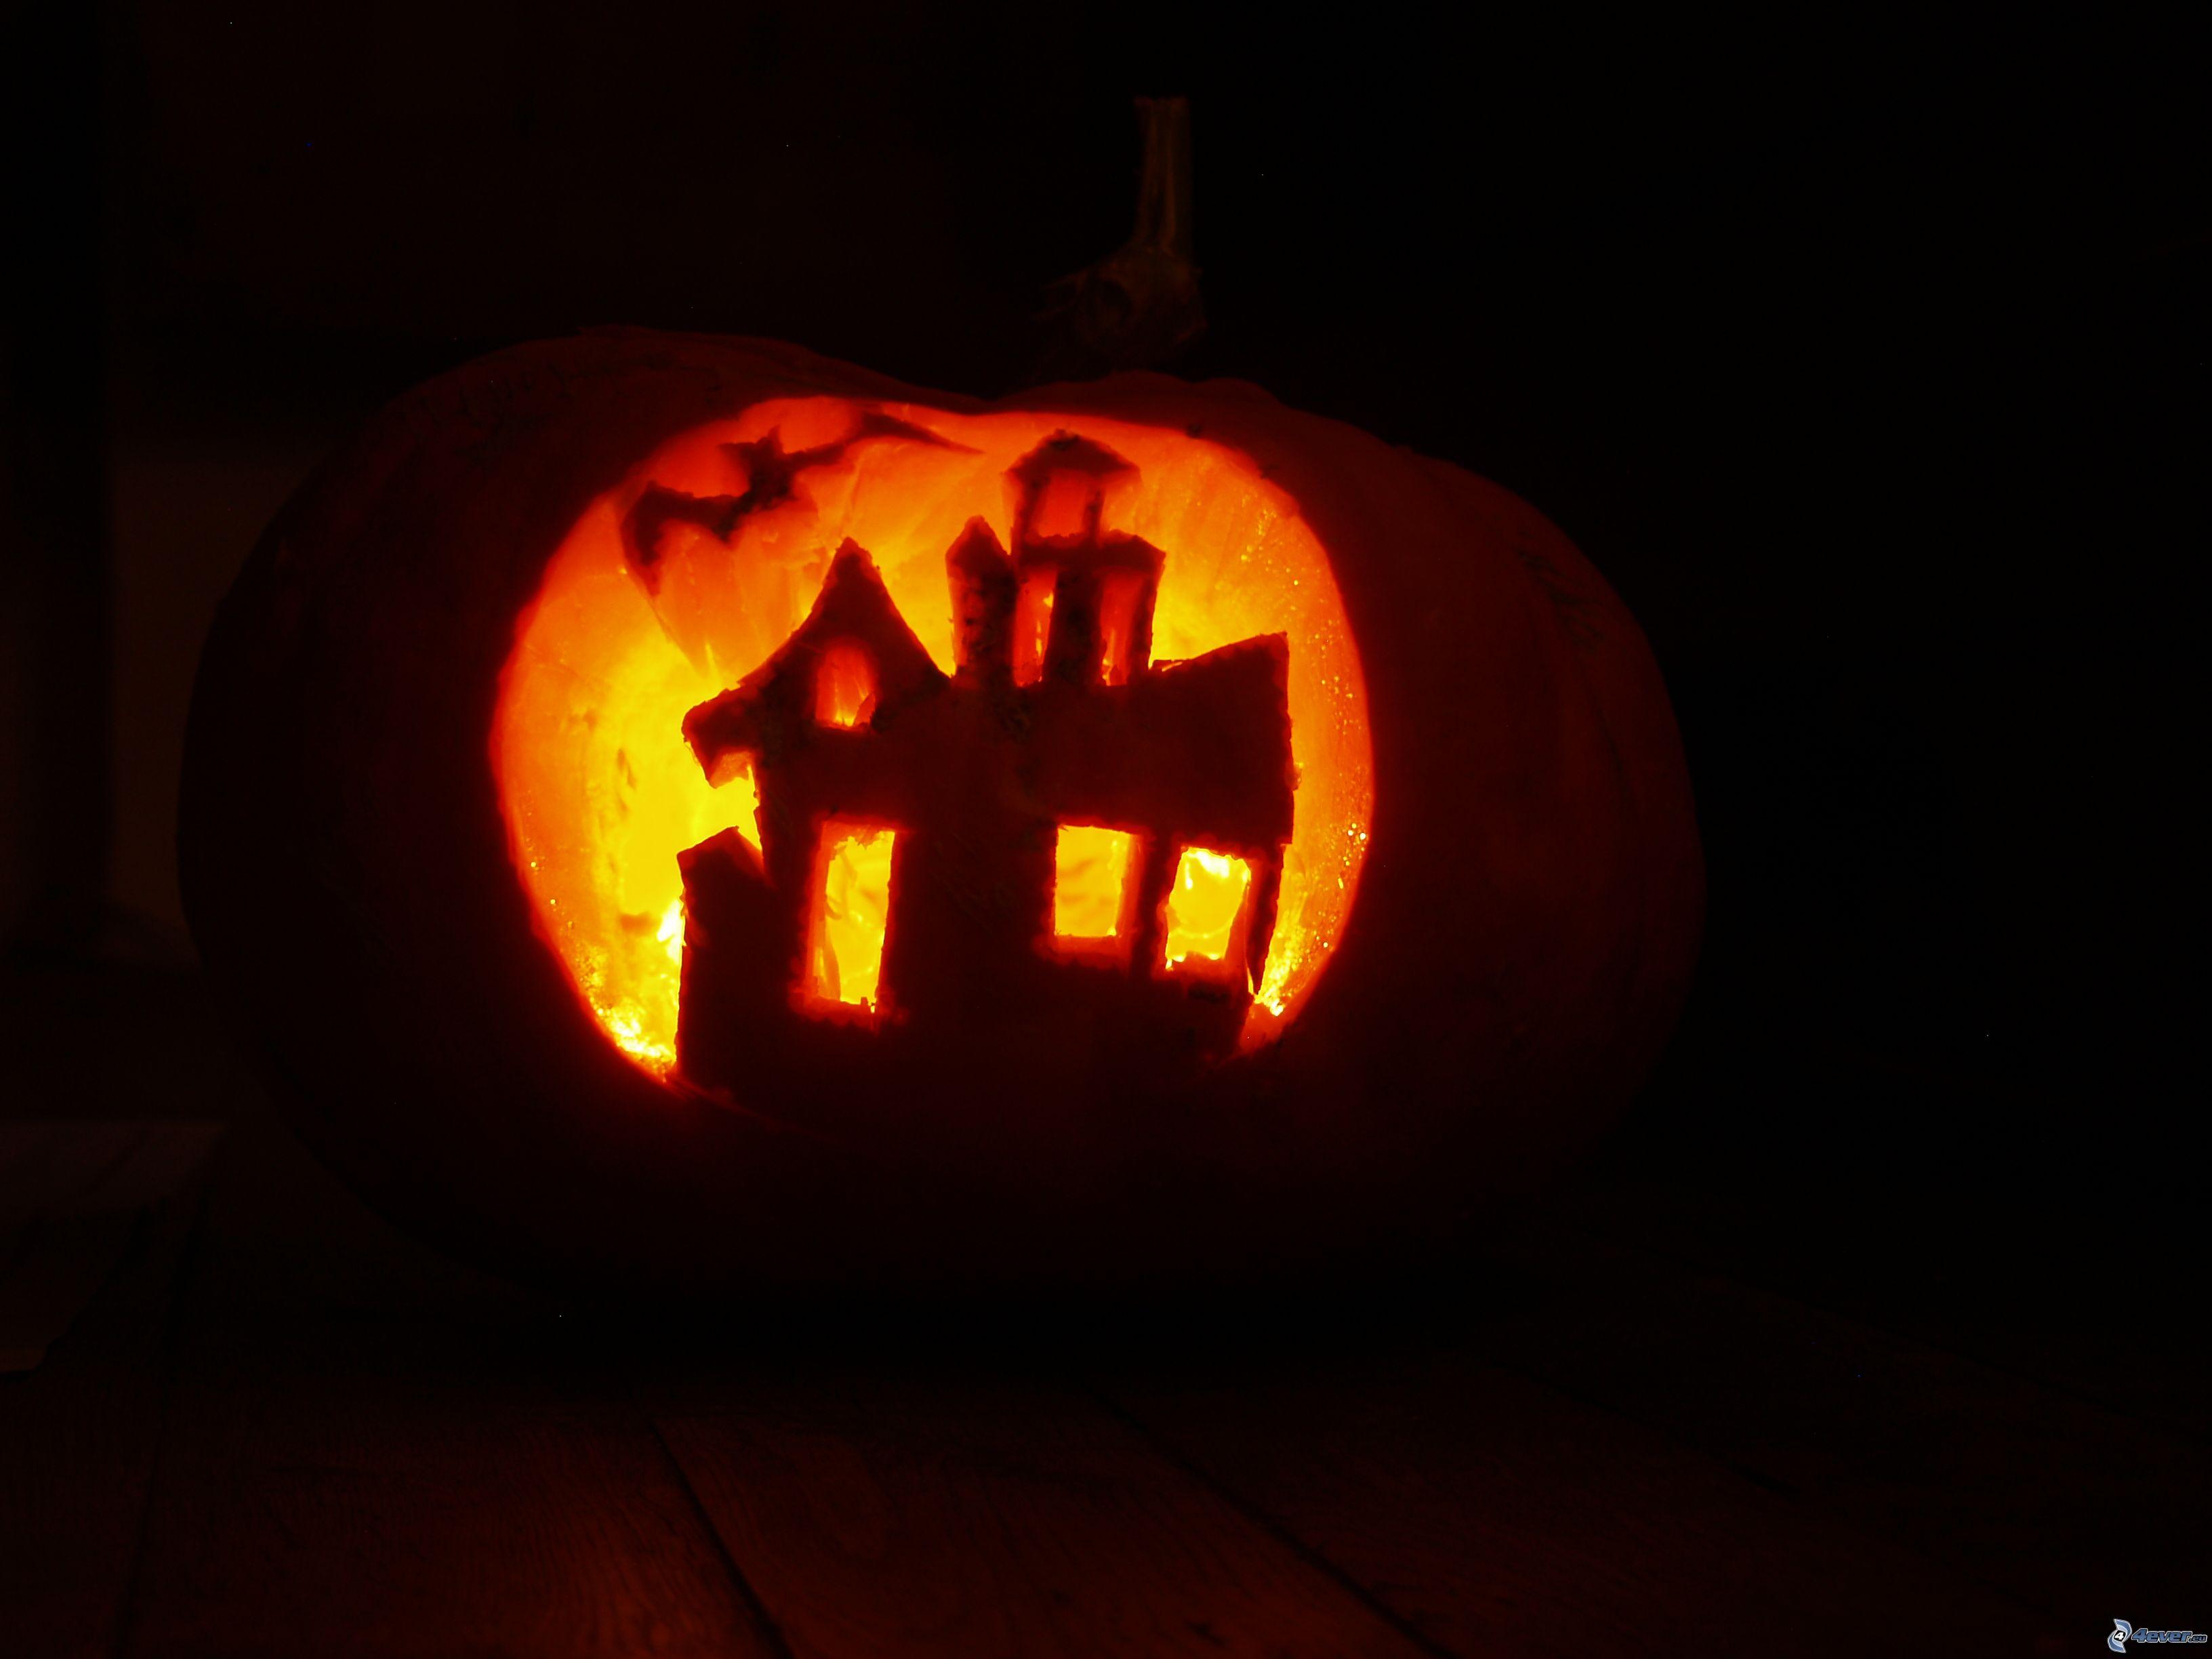 halloween pumpkin house by - photo #11